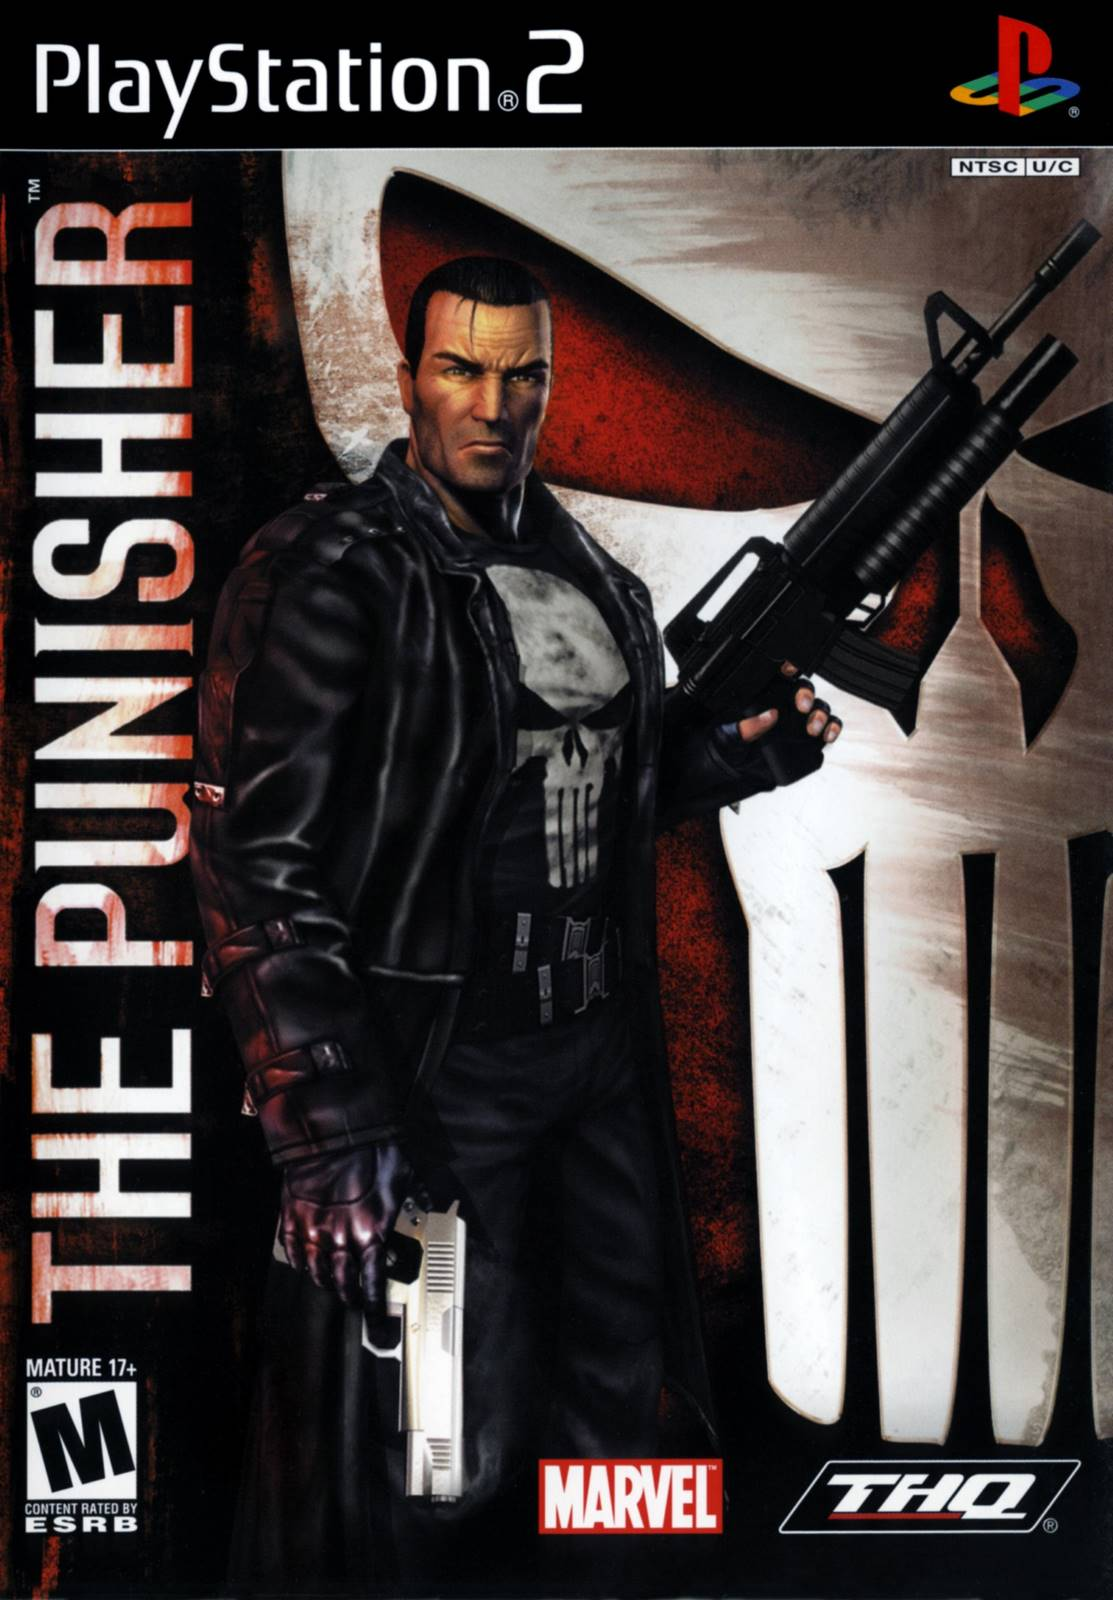 punisher sony playstation 2 game